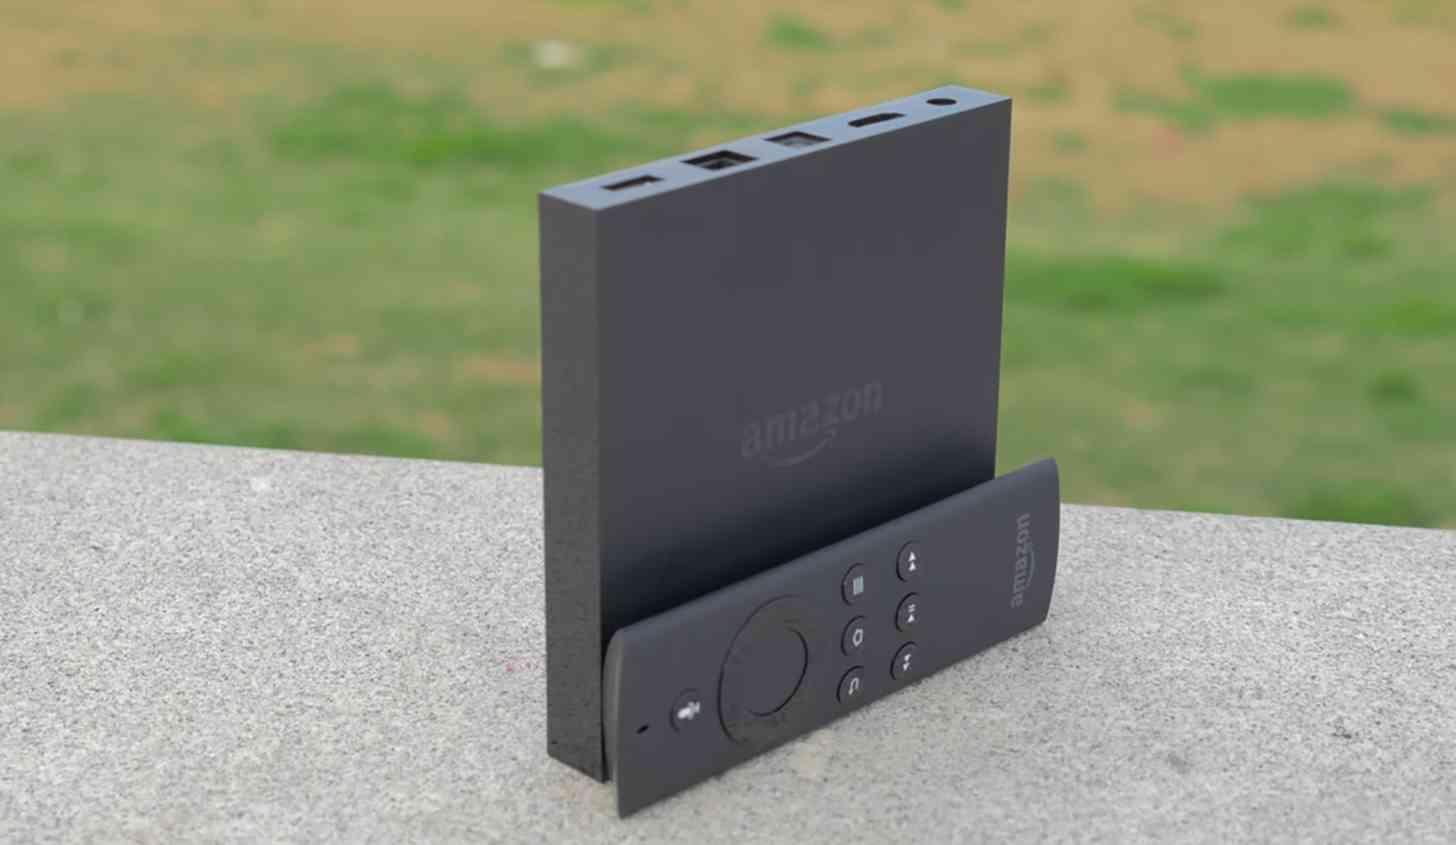 Amazon Fire TV hands on